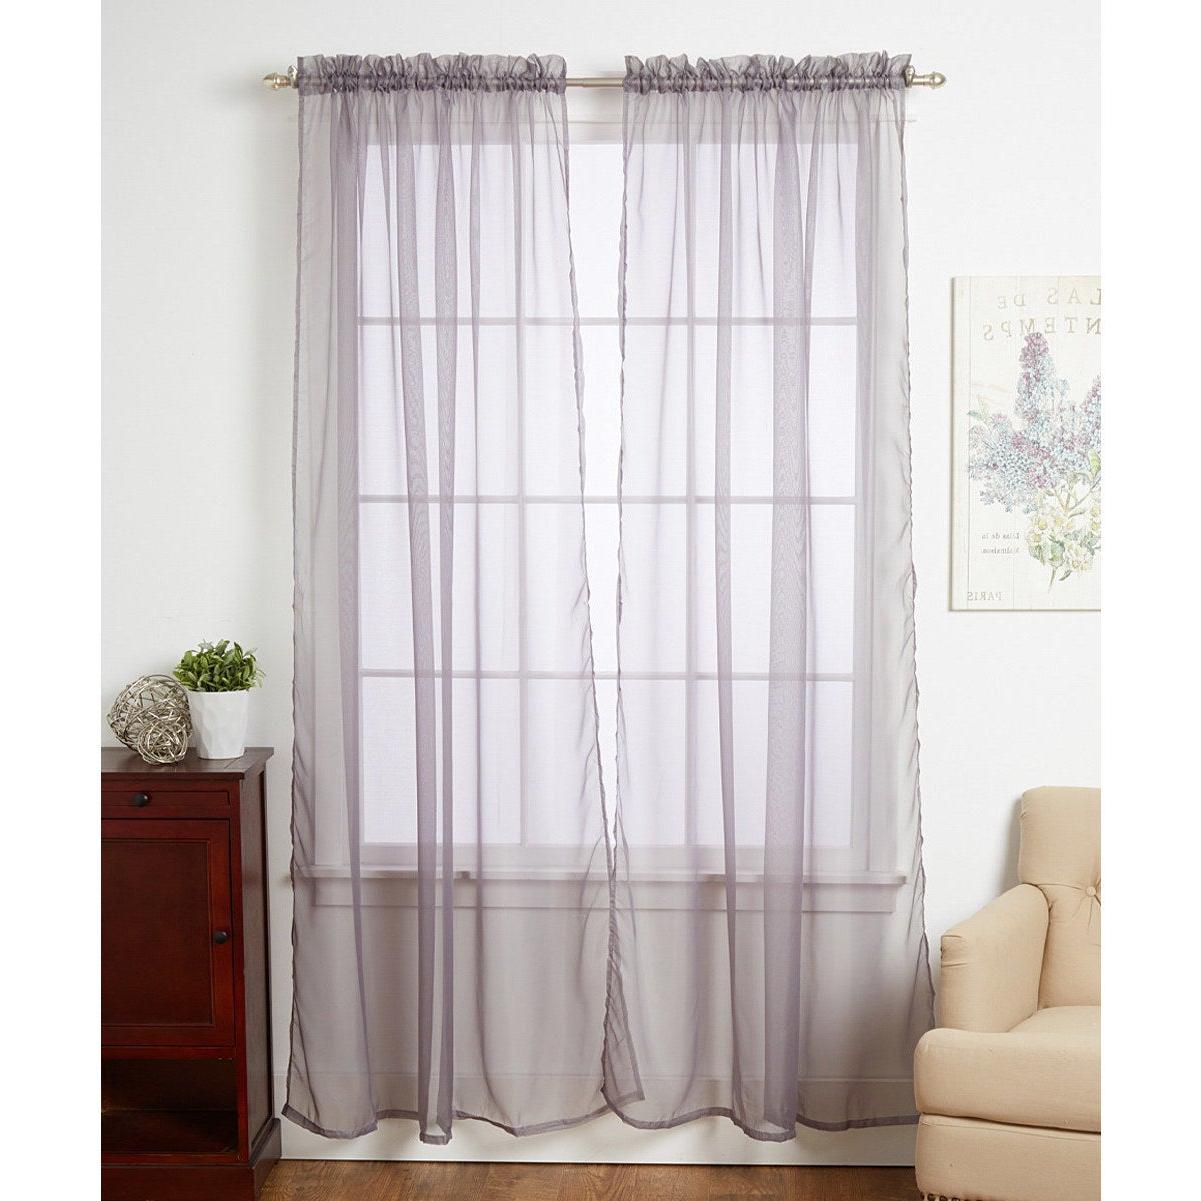 Elegant Comfort Window Sheer Curtain Panel Pairs Pertaining To Favorite Linda Sheer Voile 4 Pack Window Curtain Panel Pairs – 55 X (View 5 of 20)